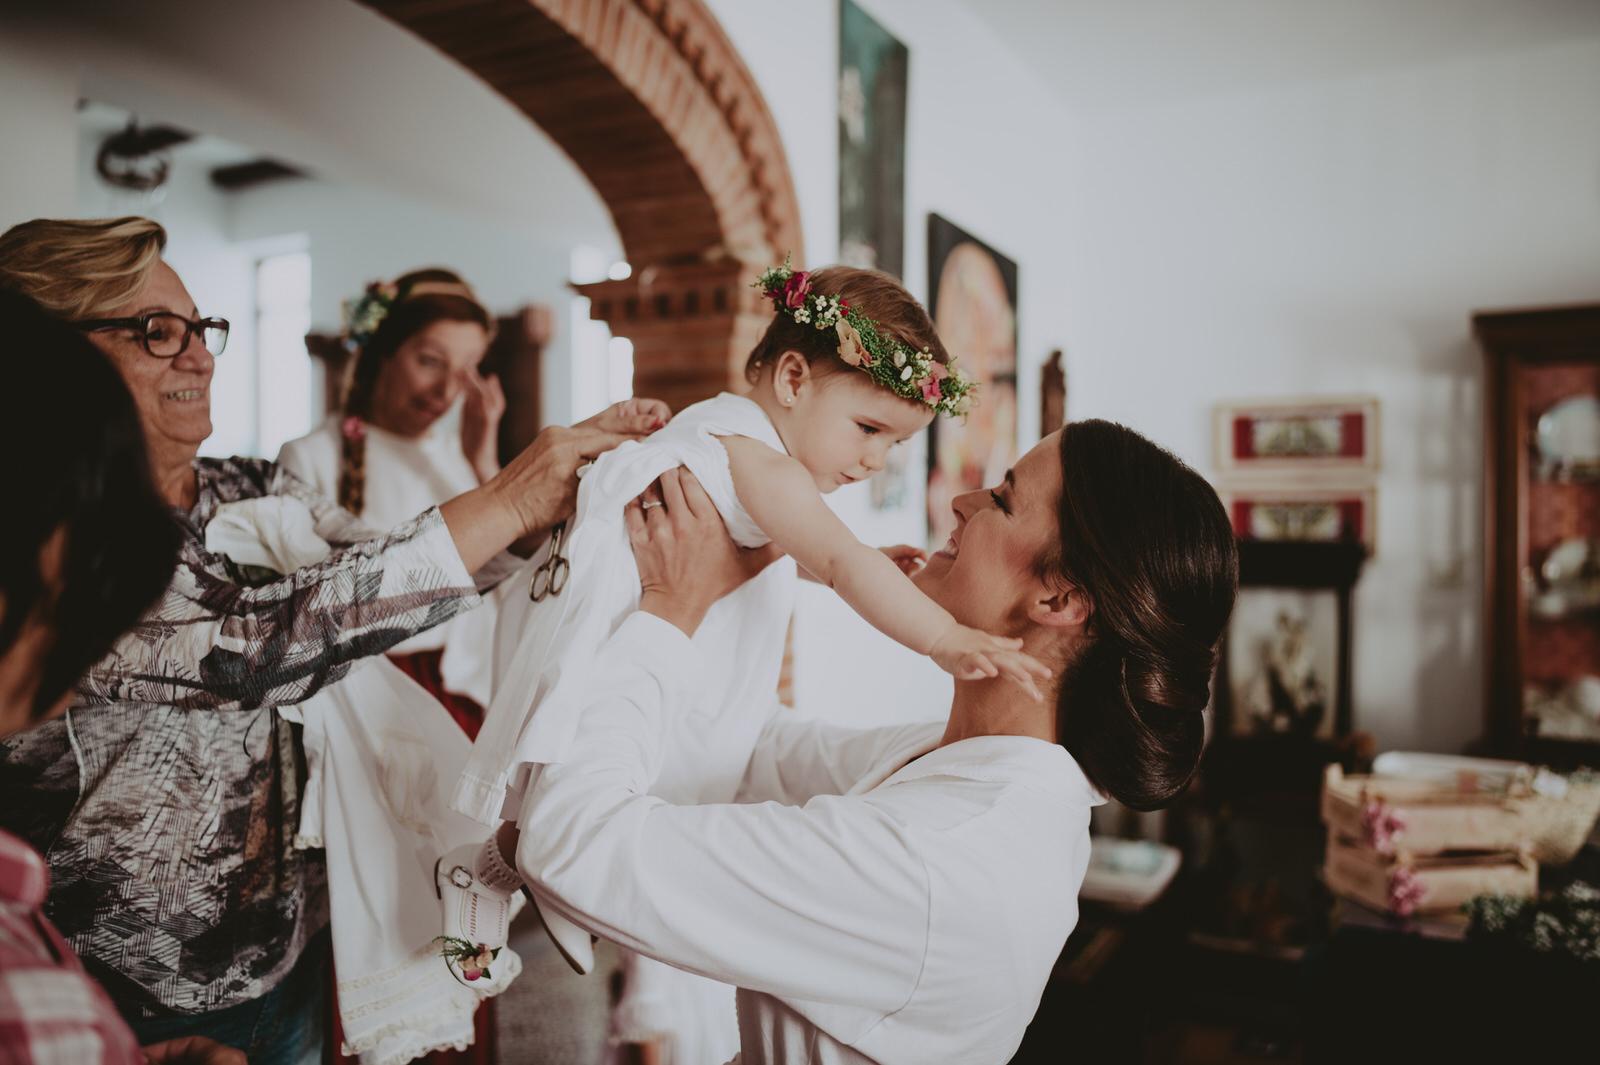 Judith & Gabriel - Boda en Olivares - Albaida, Fotógrafo de boda Andrés Amarillo - 5.JPG